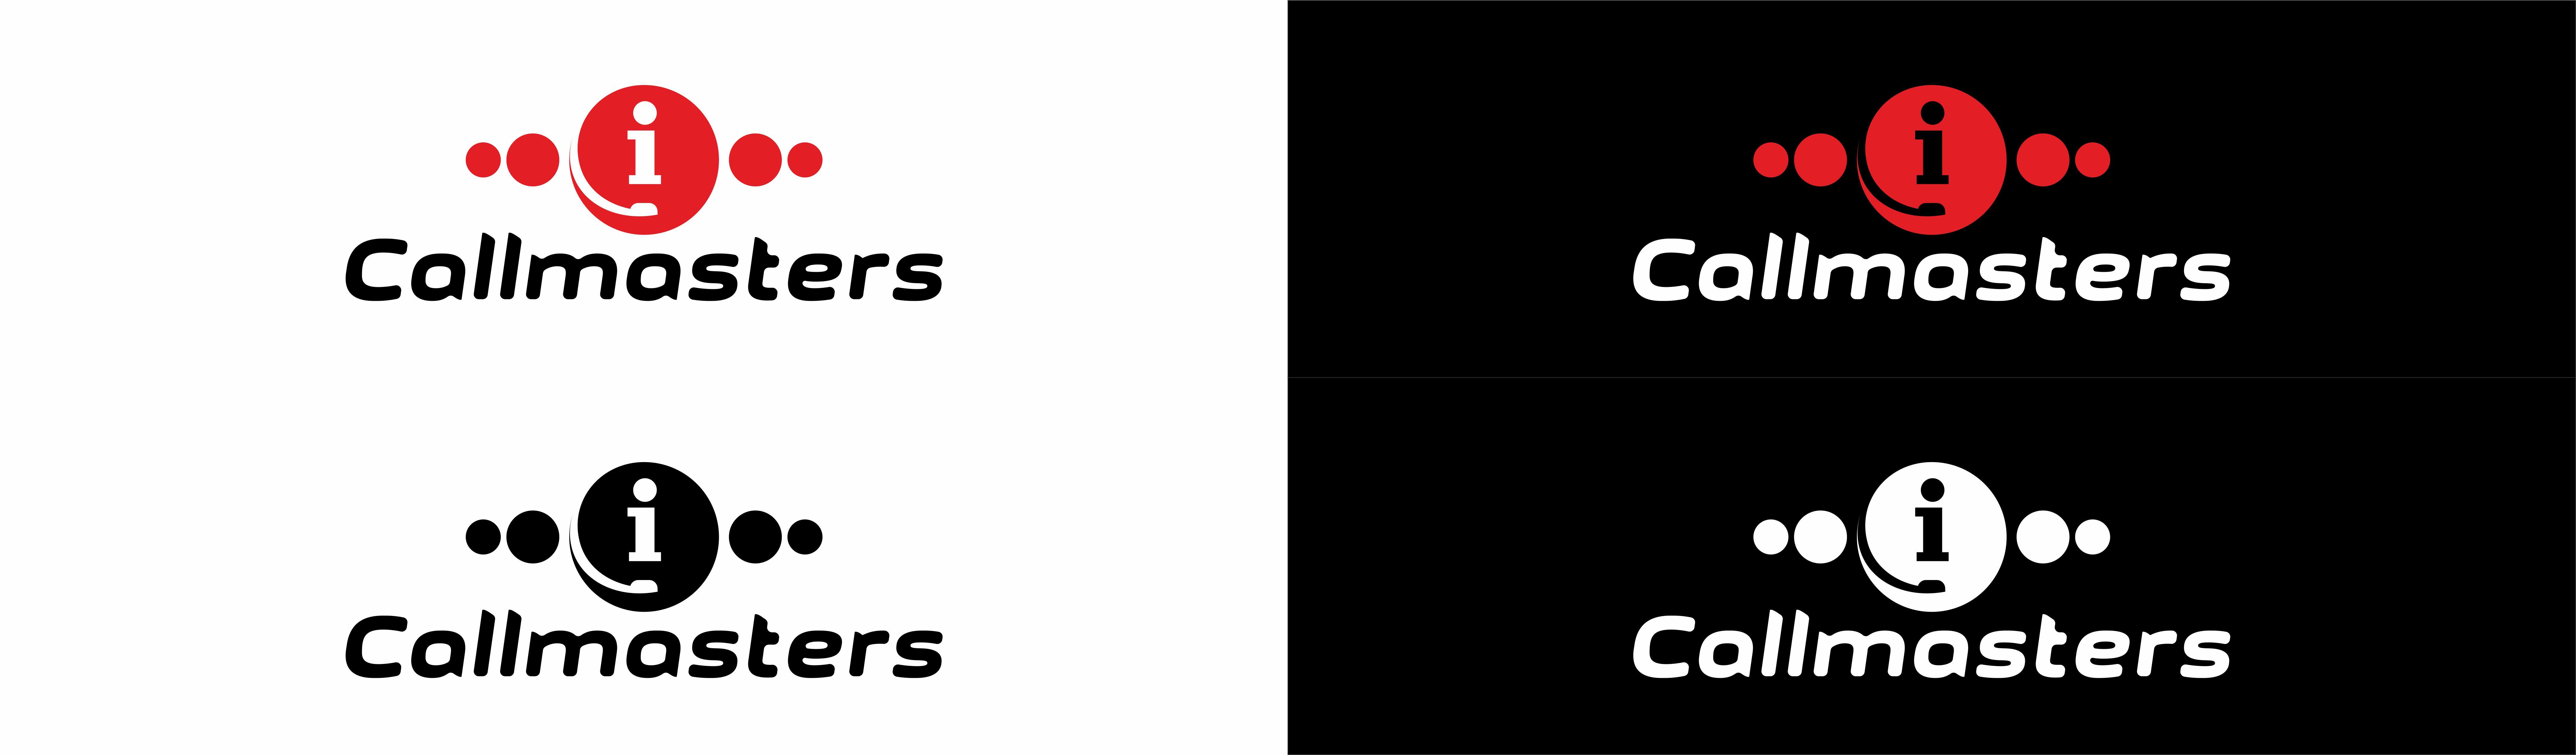 Логотип call-центра Callmasters  фото f_3745b74804ad7bdb.jpg